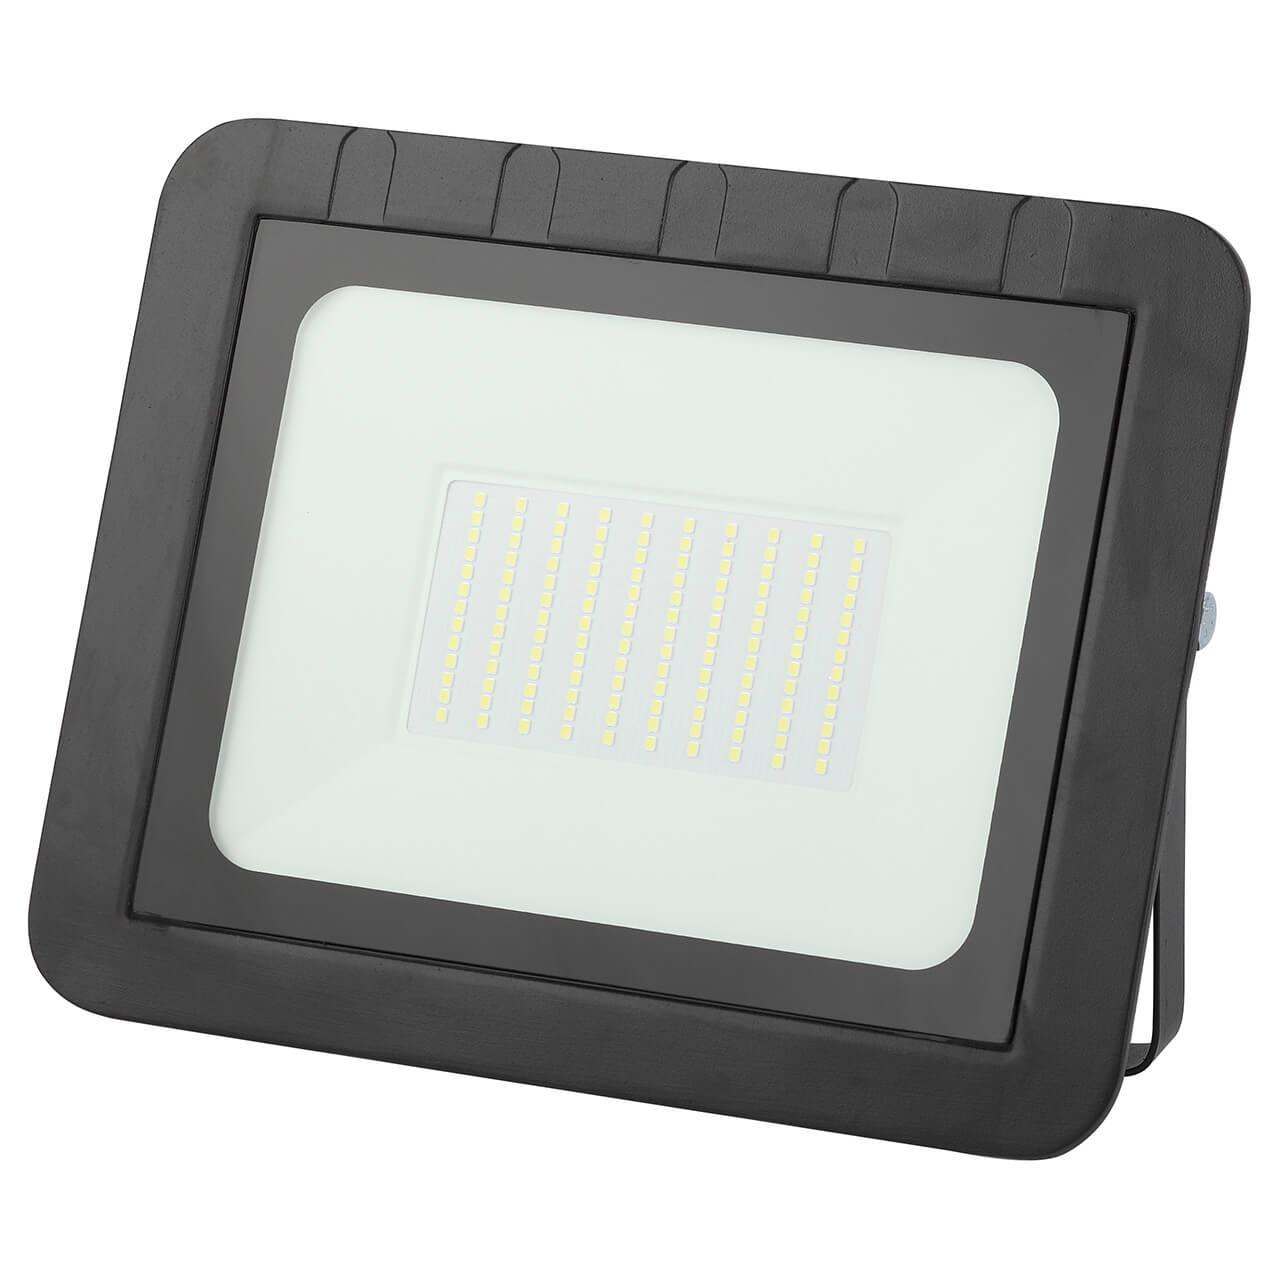 Прожектор ЭРА LPR-061-0-65K-150 LPR-061